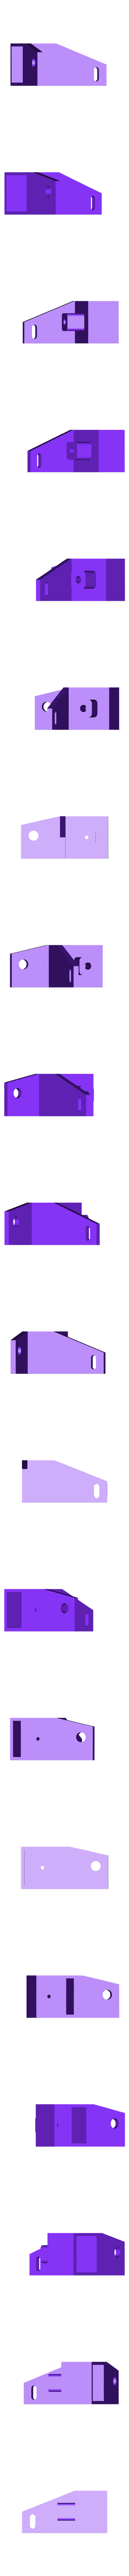 supporto.stl Download free STL file Anycubic I3 Mega - Guida filo • 3D printing object, Scigola